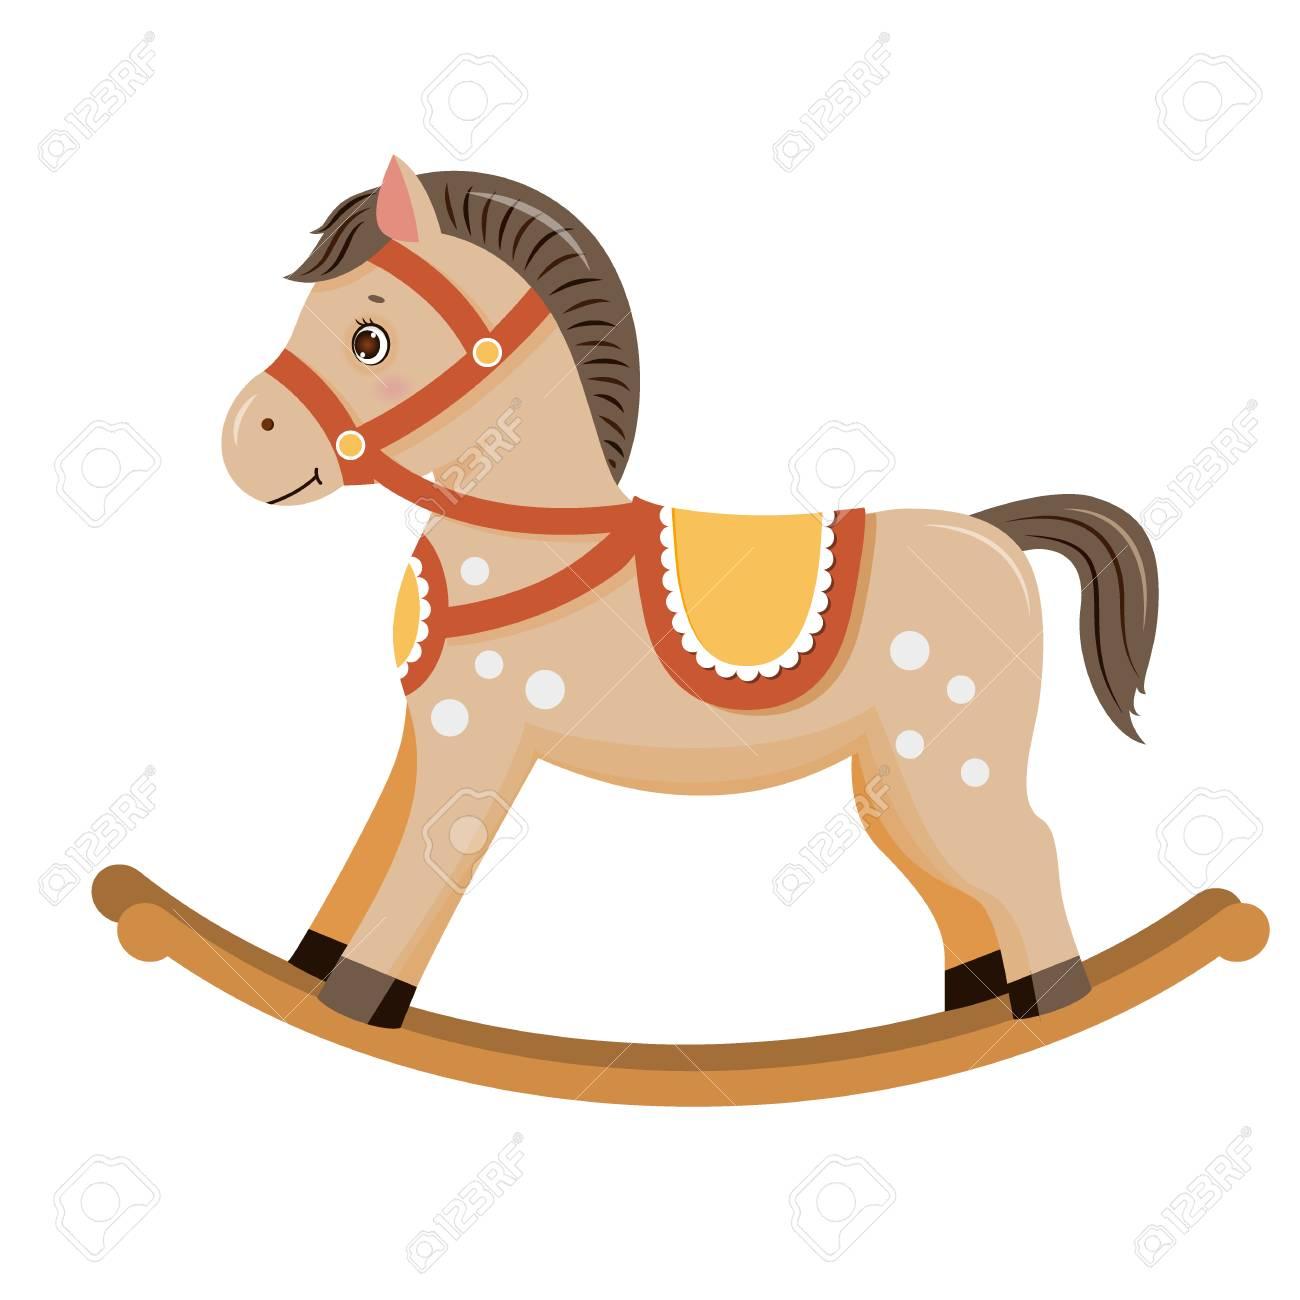 Rocking horse baby toy.